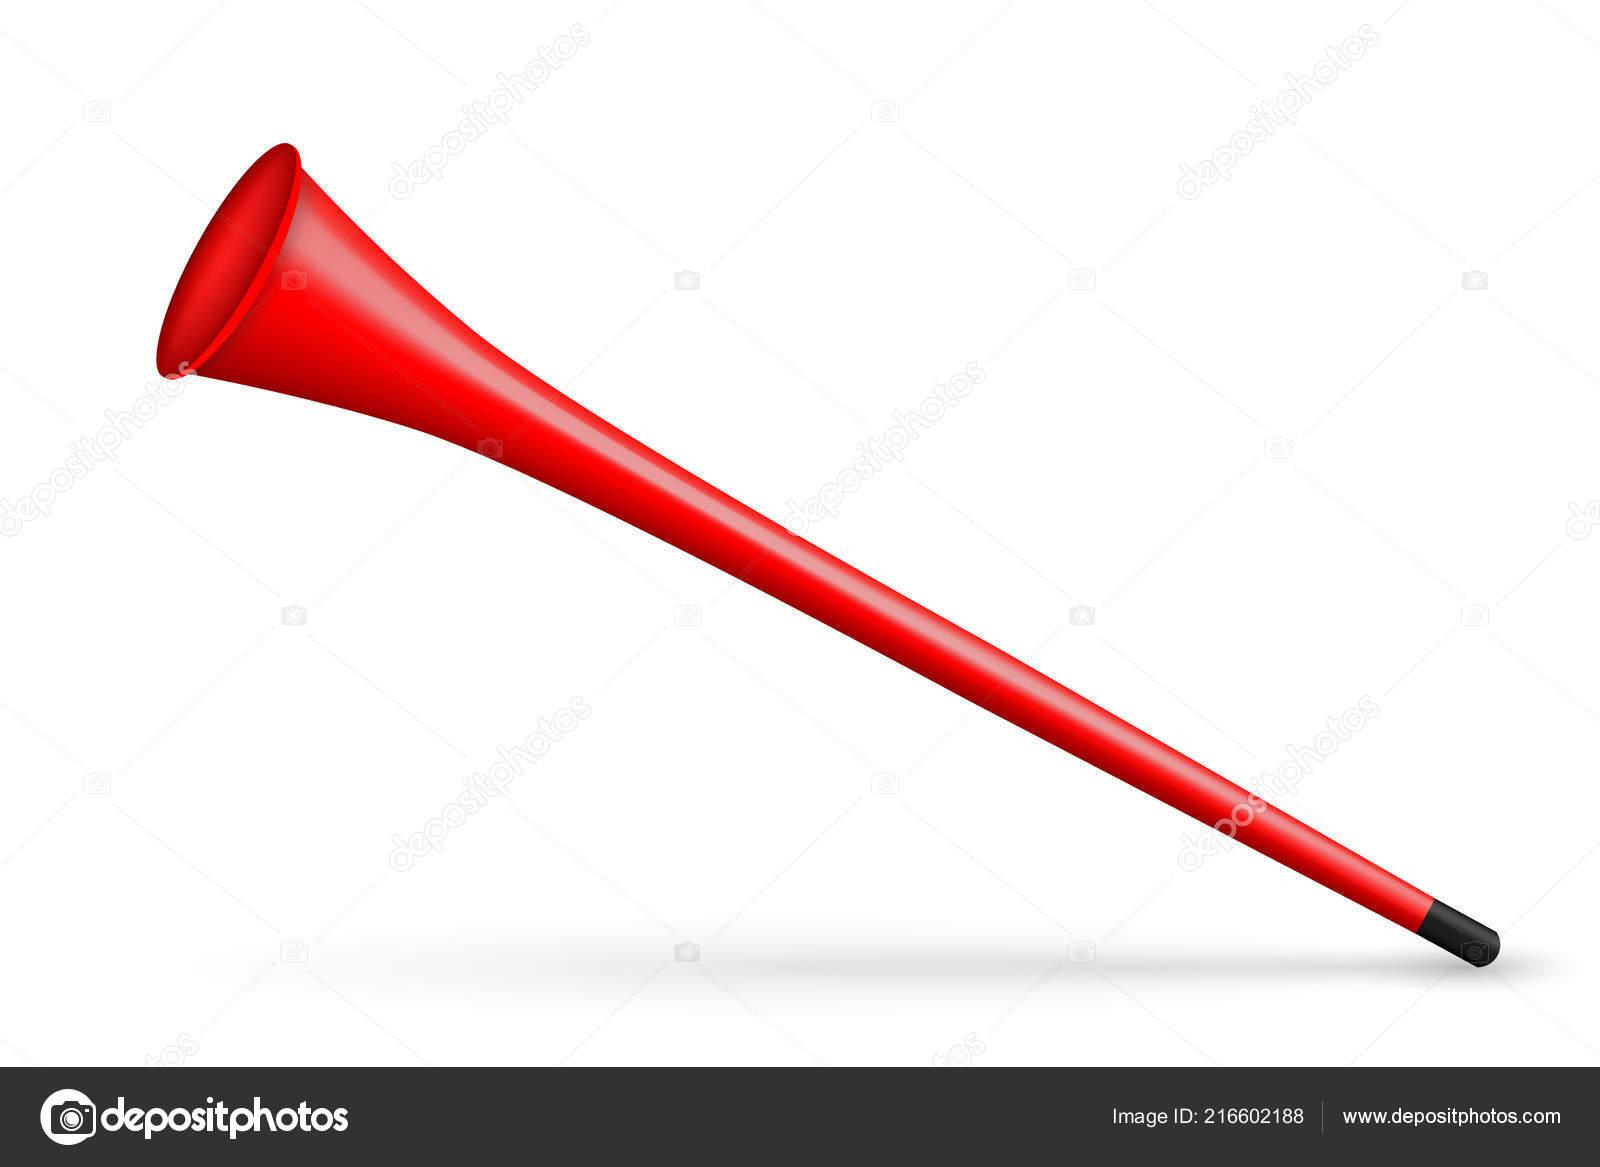 Kreative Vektor Illustration Der Vuvuzela Trompete Rohr